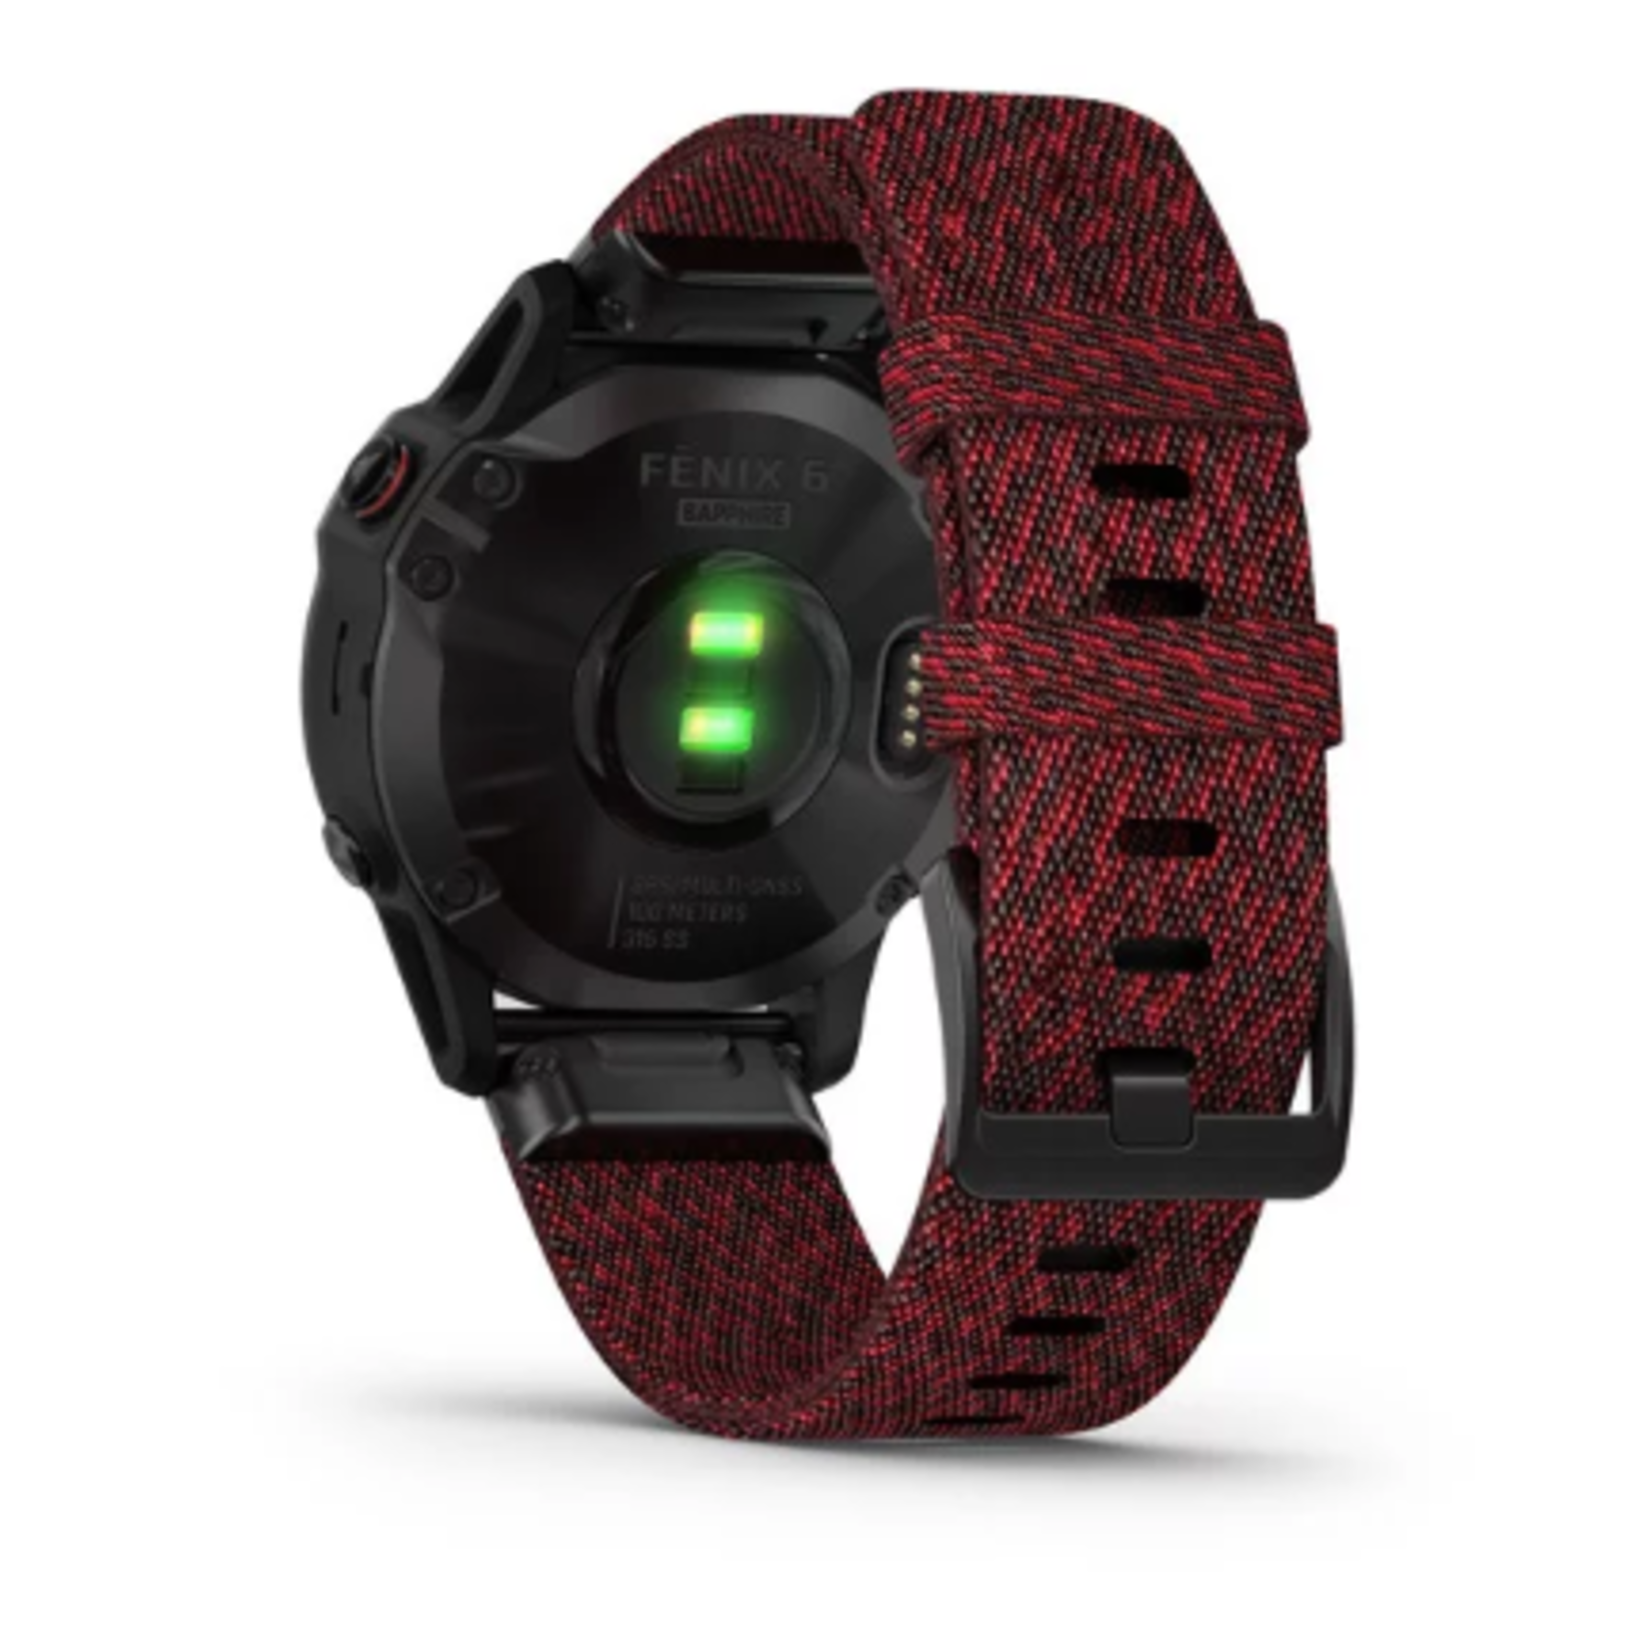 Garmin fēnix® 6 Sapphire - Black DLC with Heathered Red Nylon Band